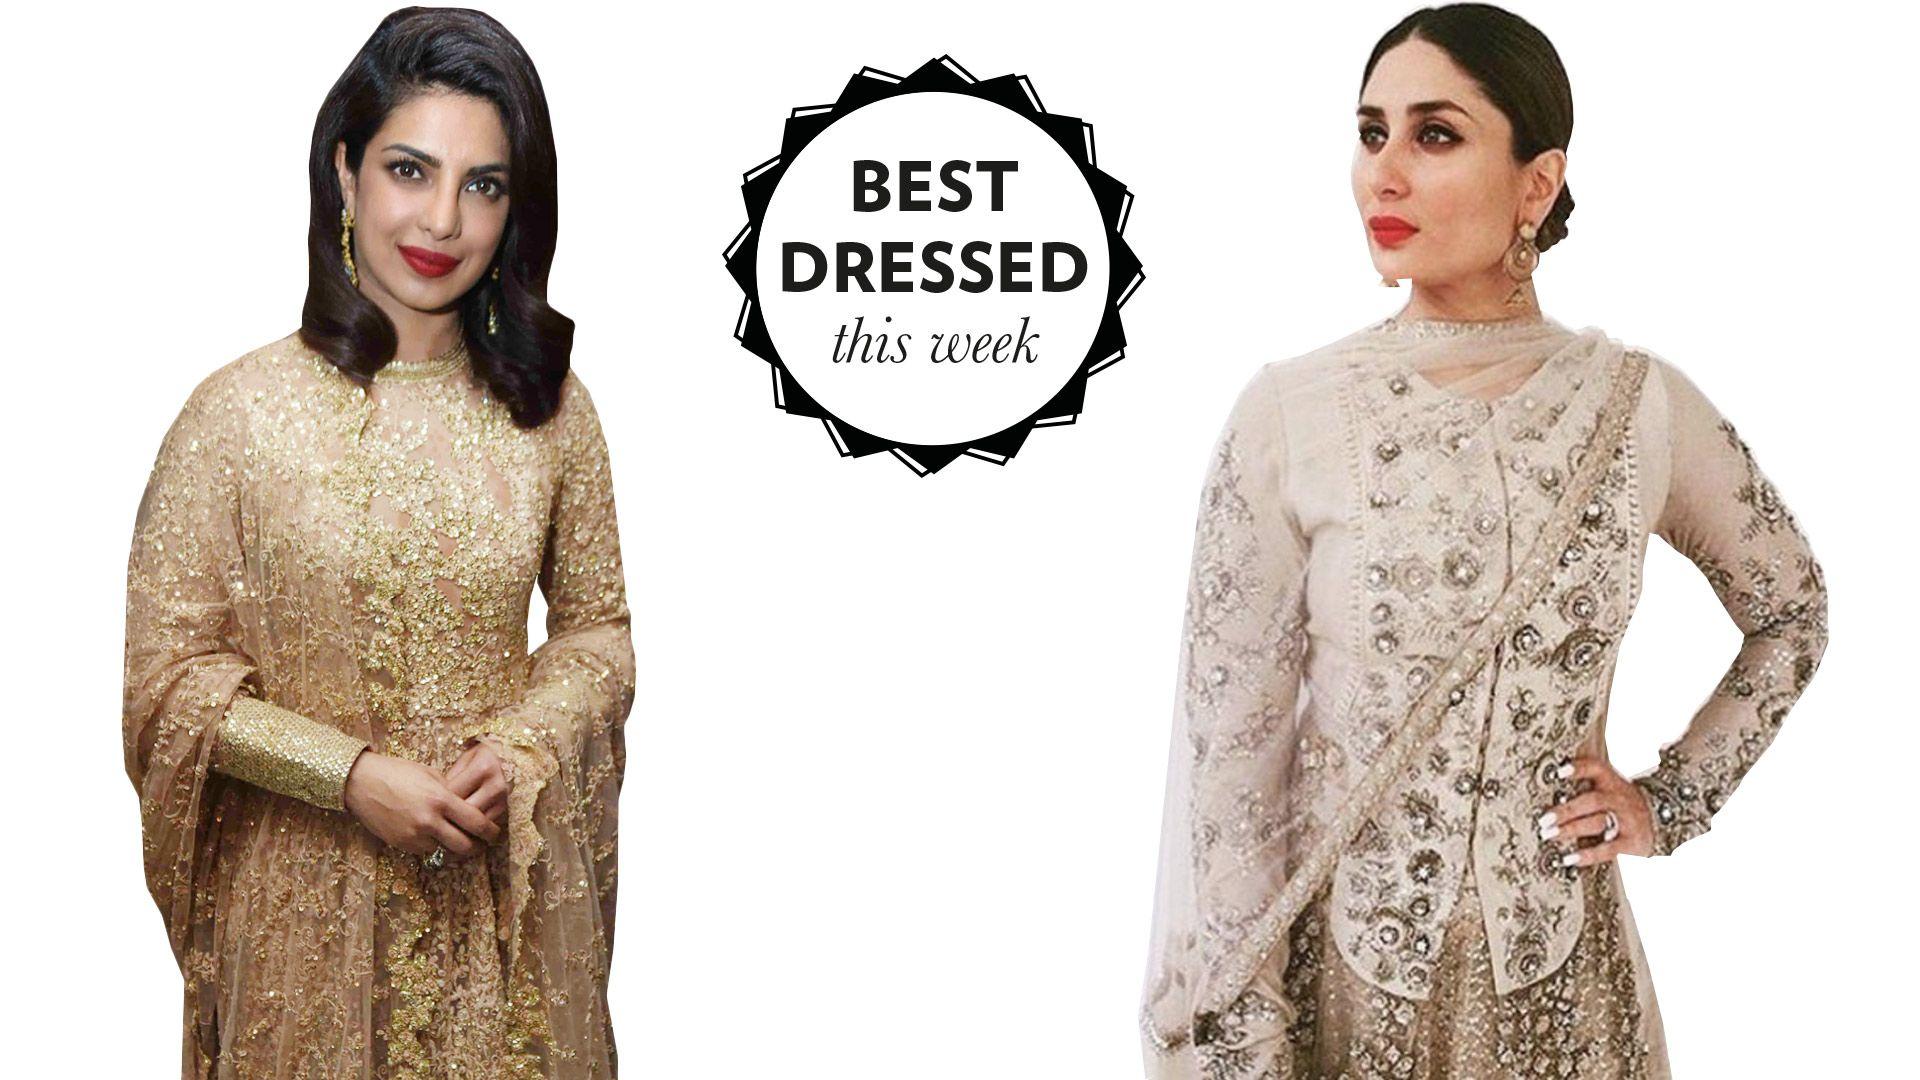 Best-dressed-this-week-Kareena-Kapoor-Khan-and-Anushka-Sharma